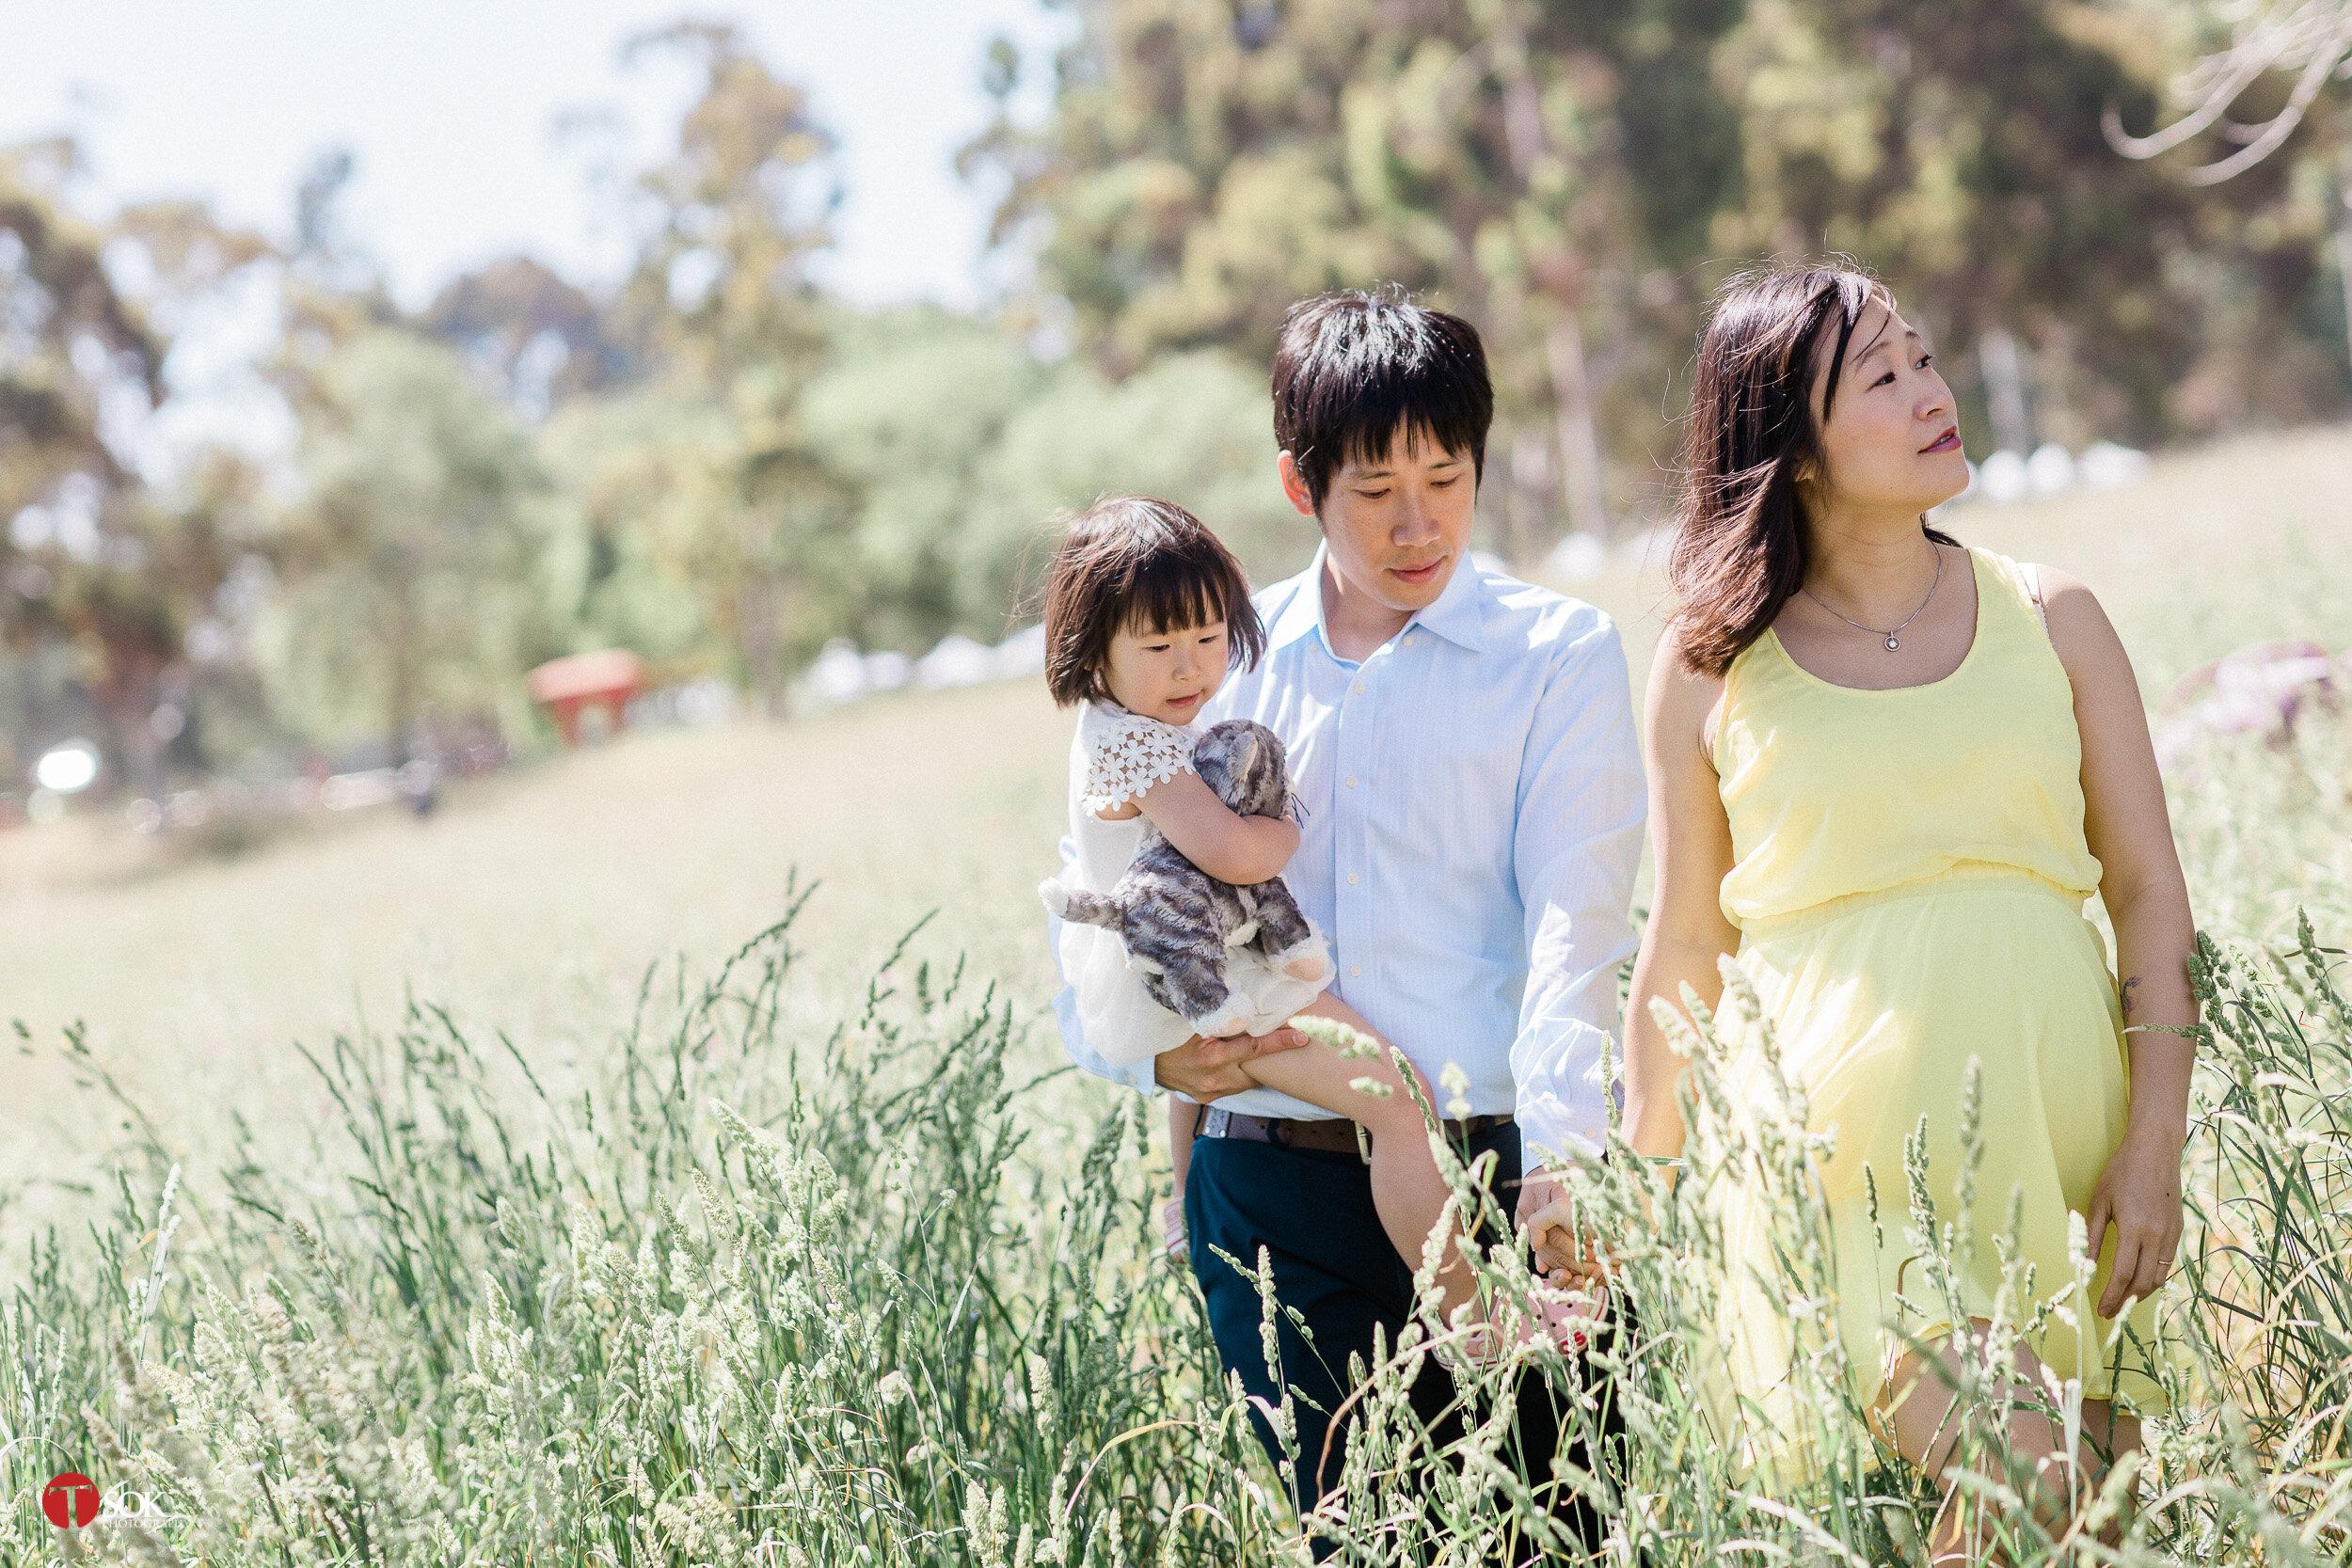 20190504_0032_yuen_maternity_baylands_park.jpg